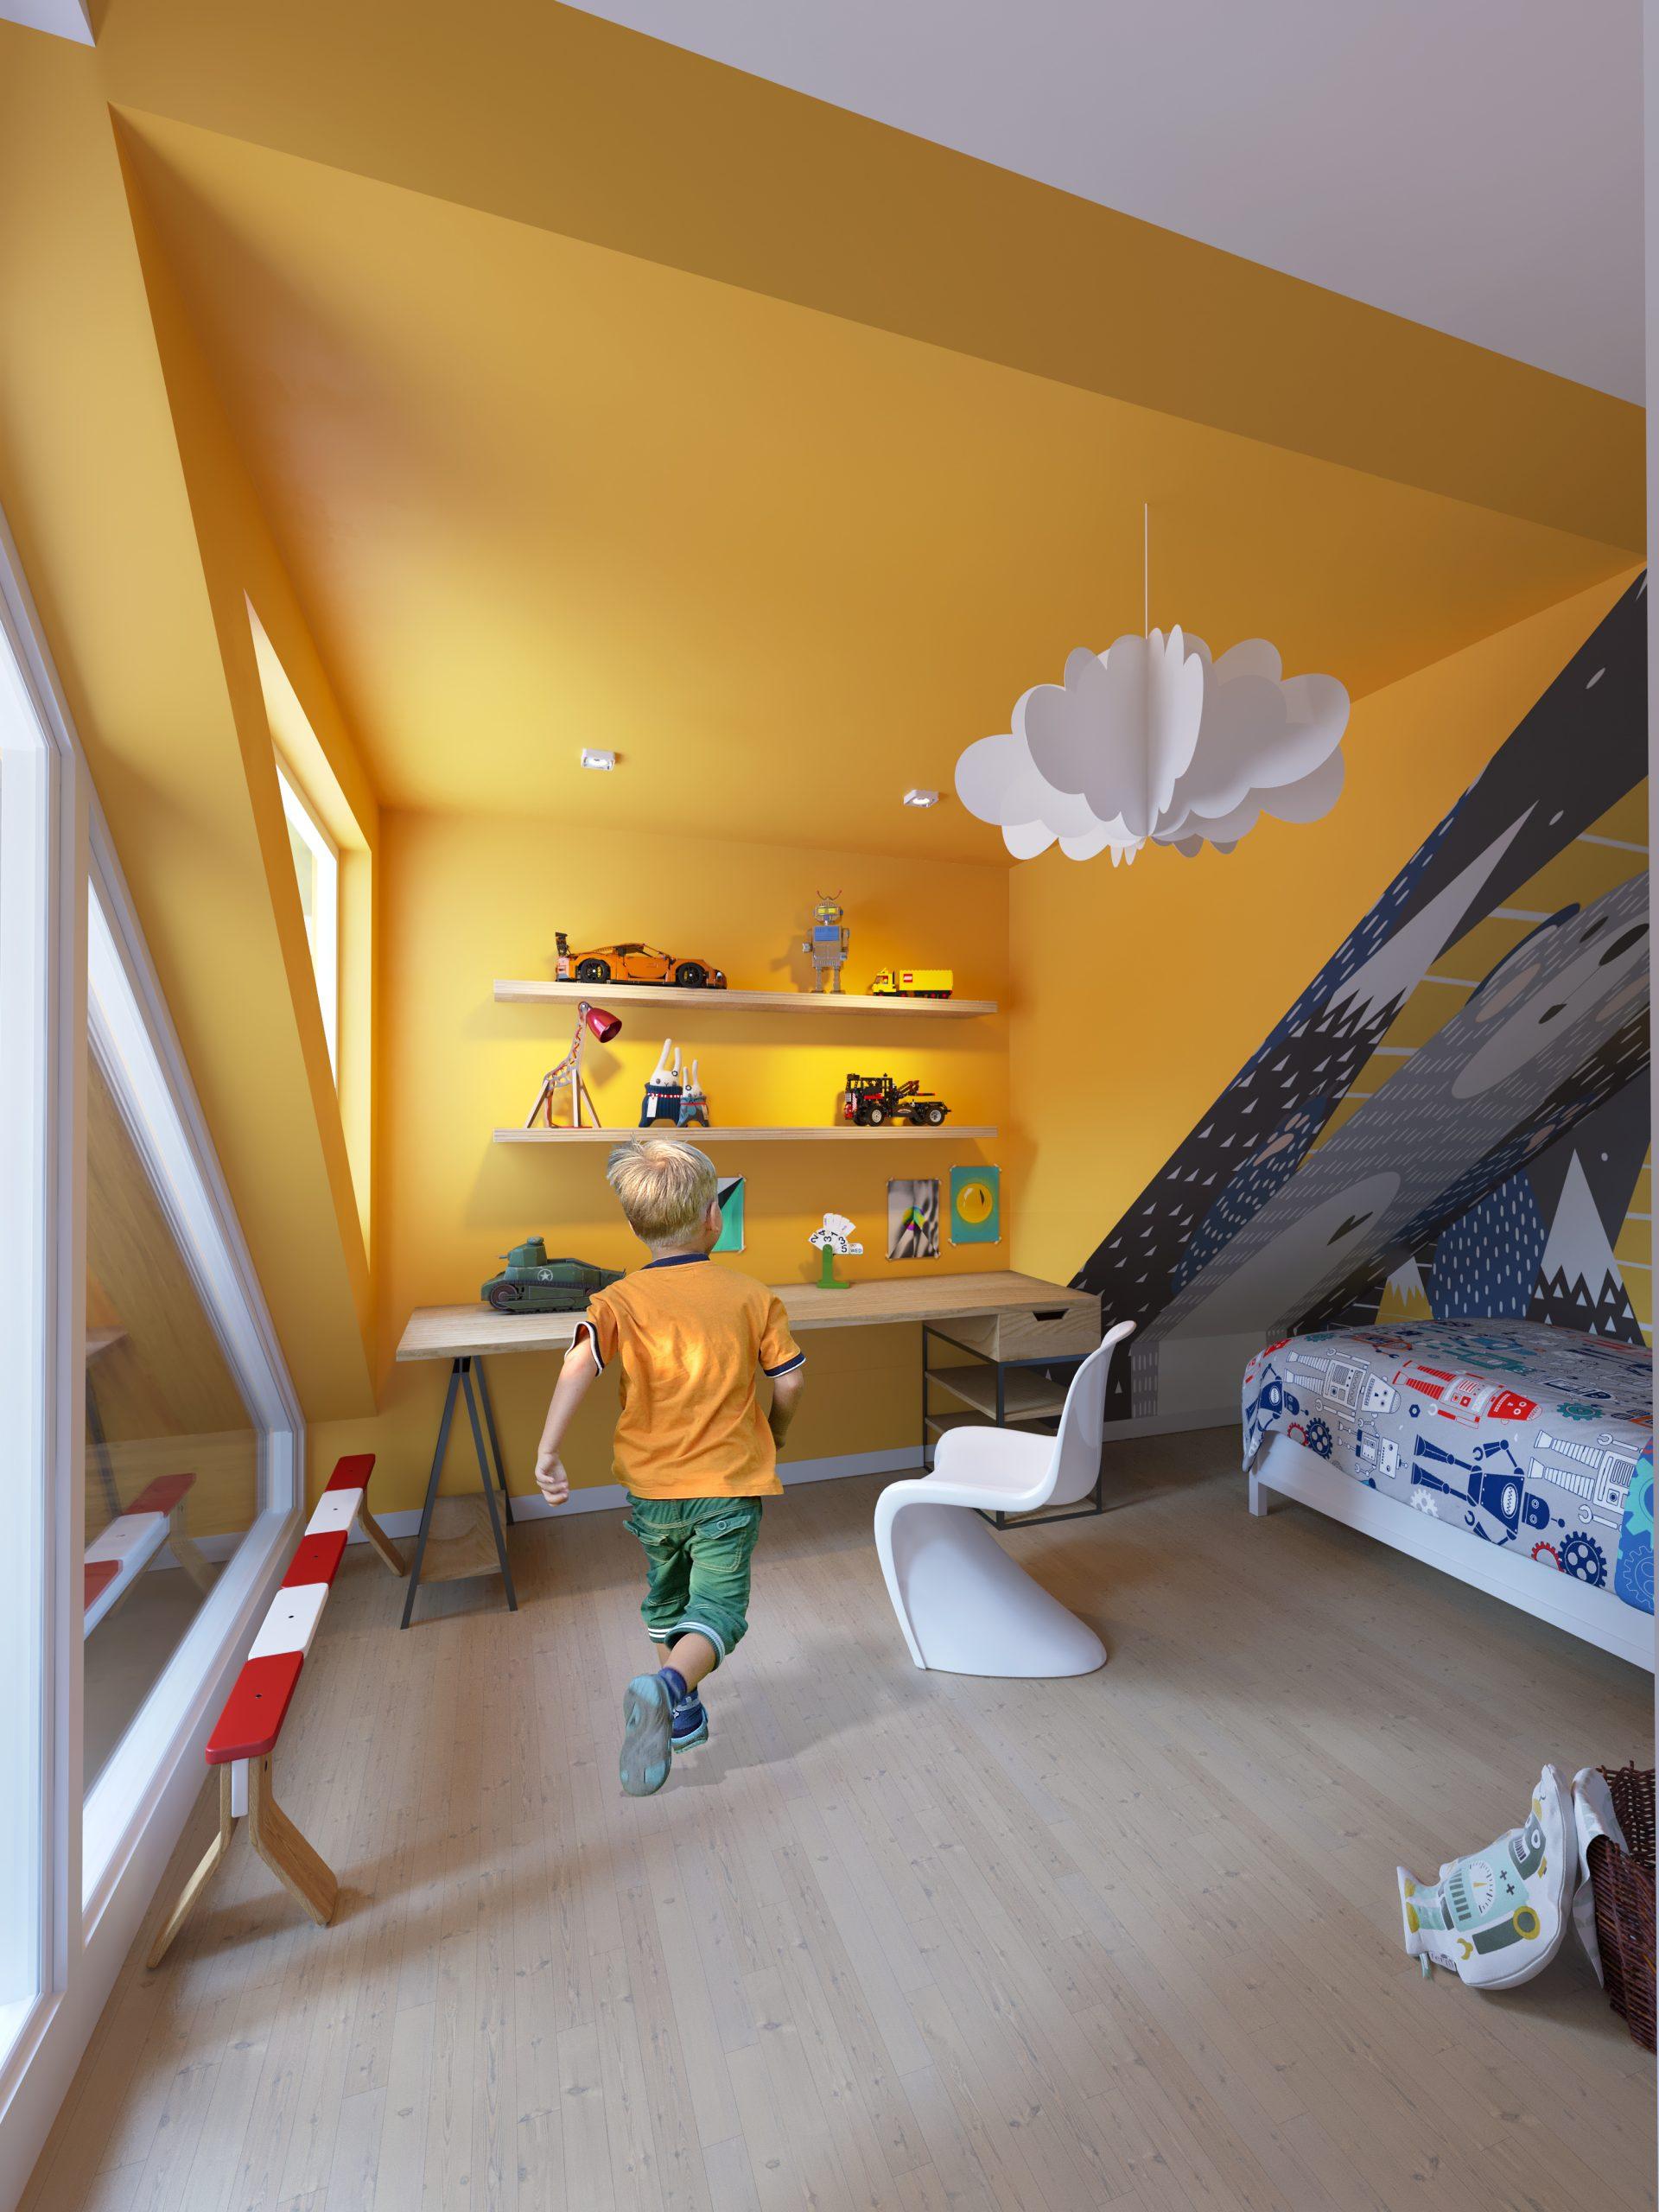 Woningbouw_3D_artist_impression